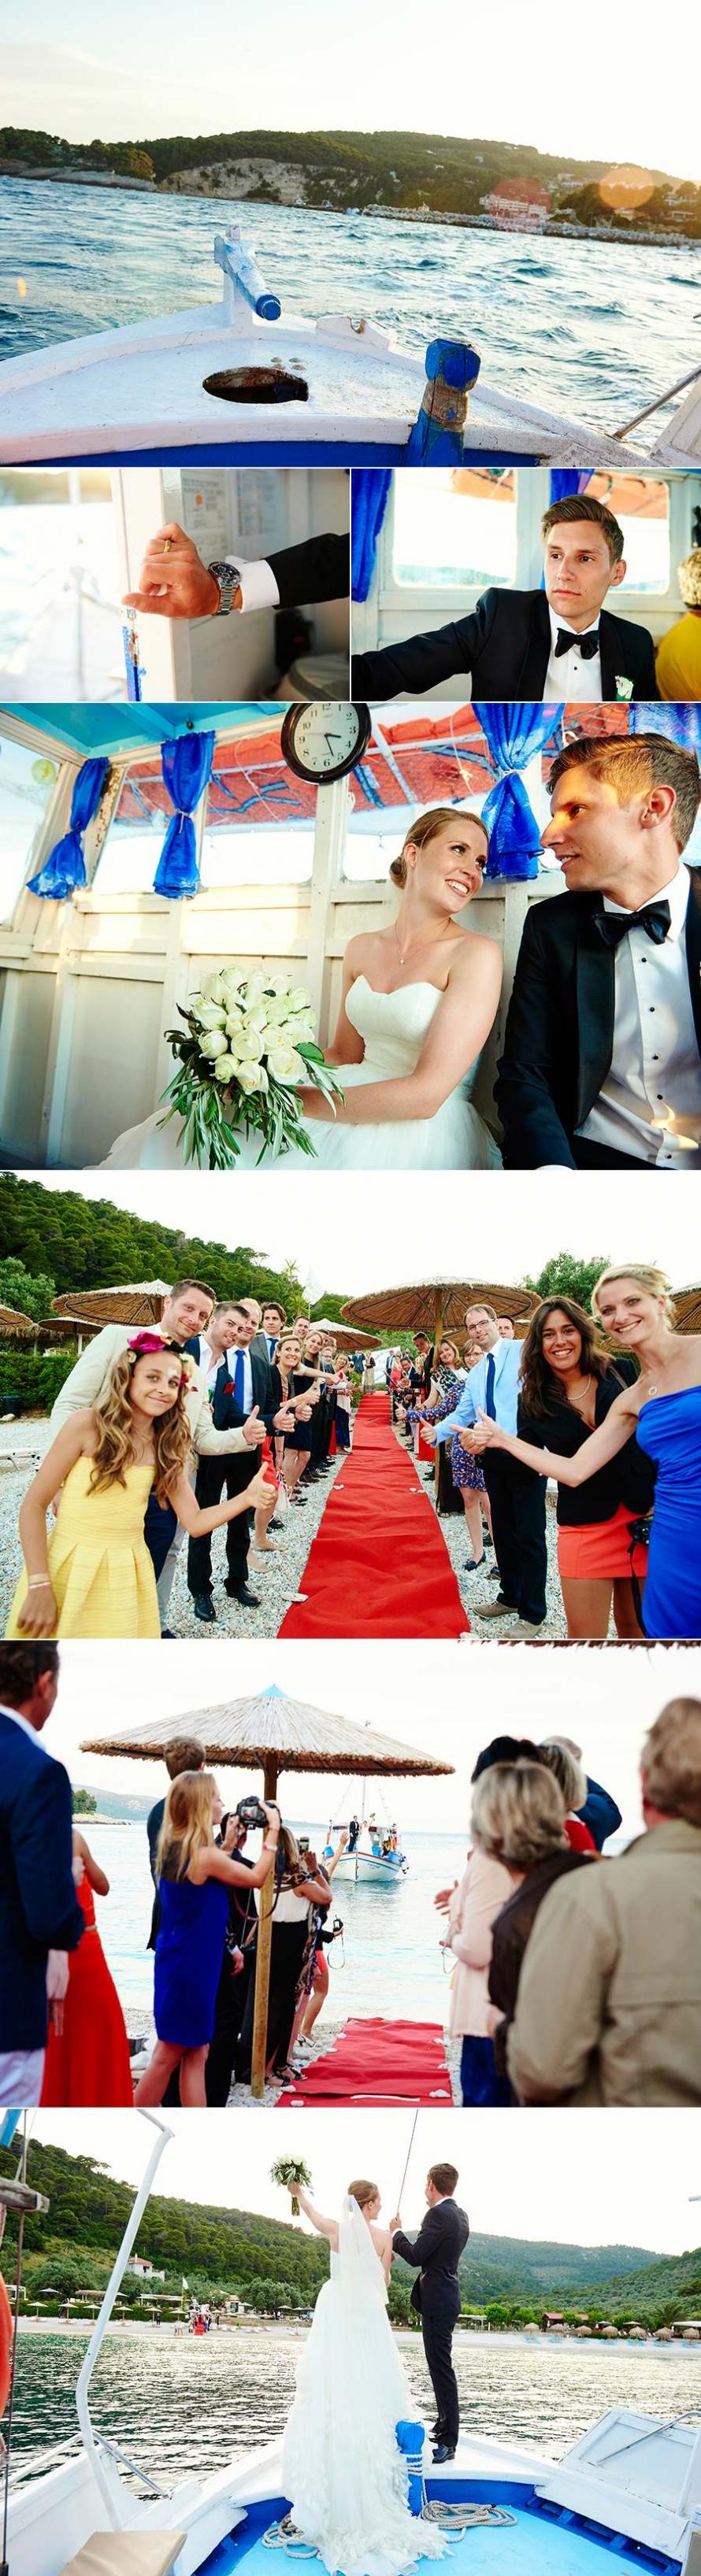 Tobi & Vanessa wedding photos 21